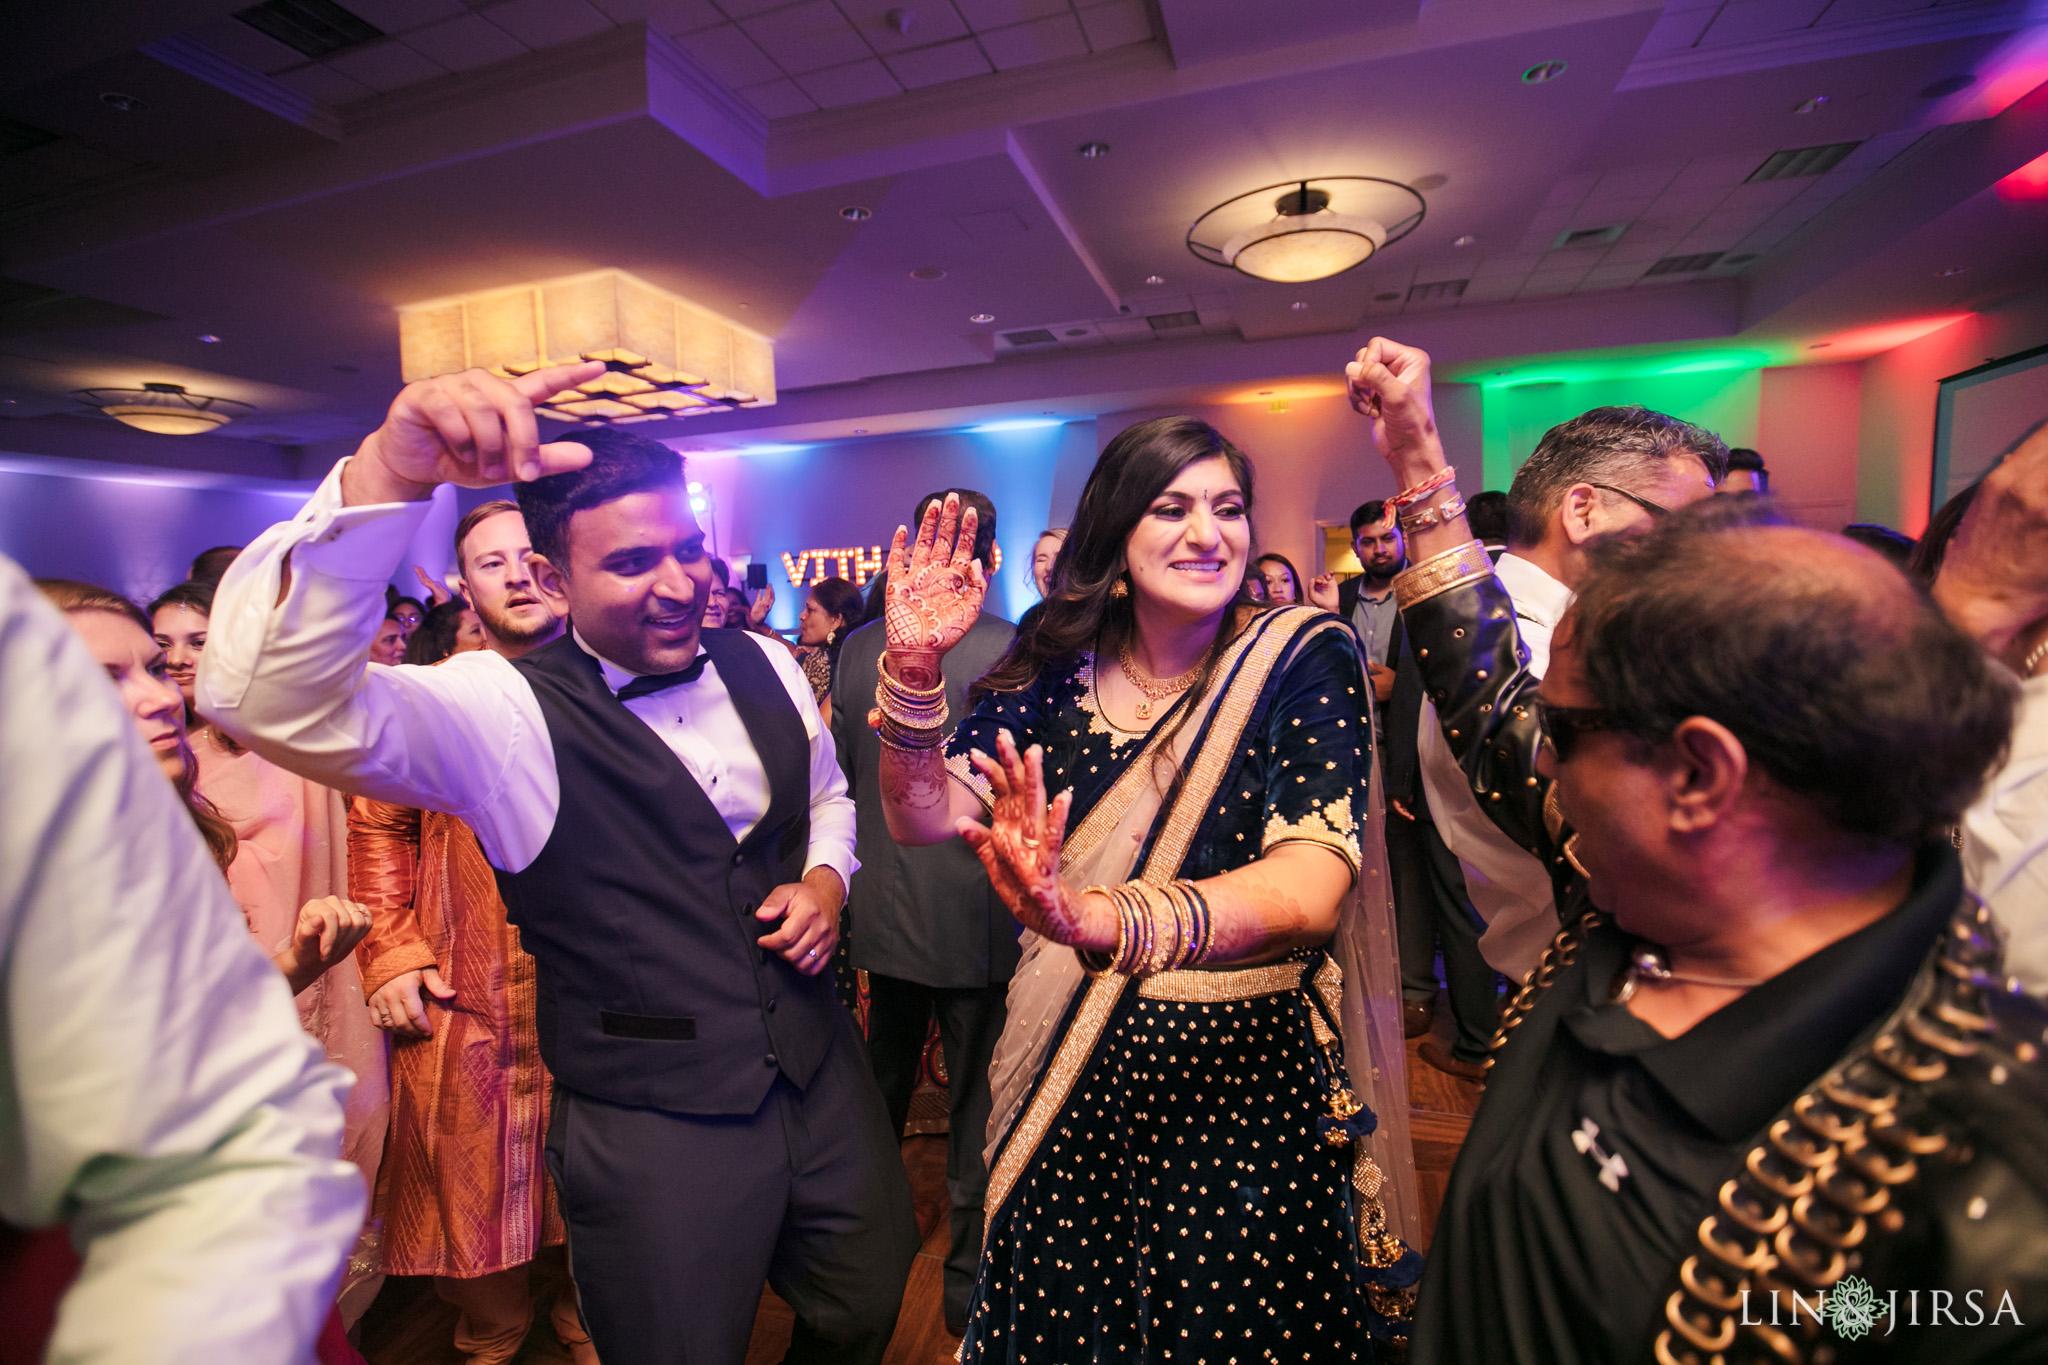 48 sheraton carlsbad resort indian wedding photography